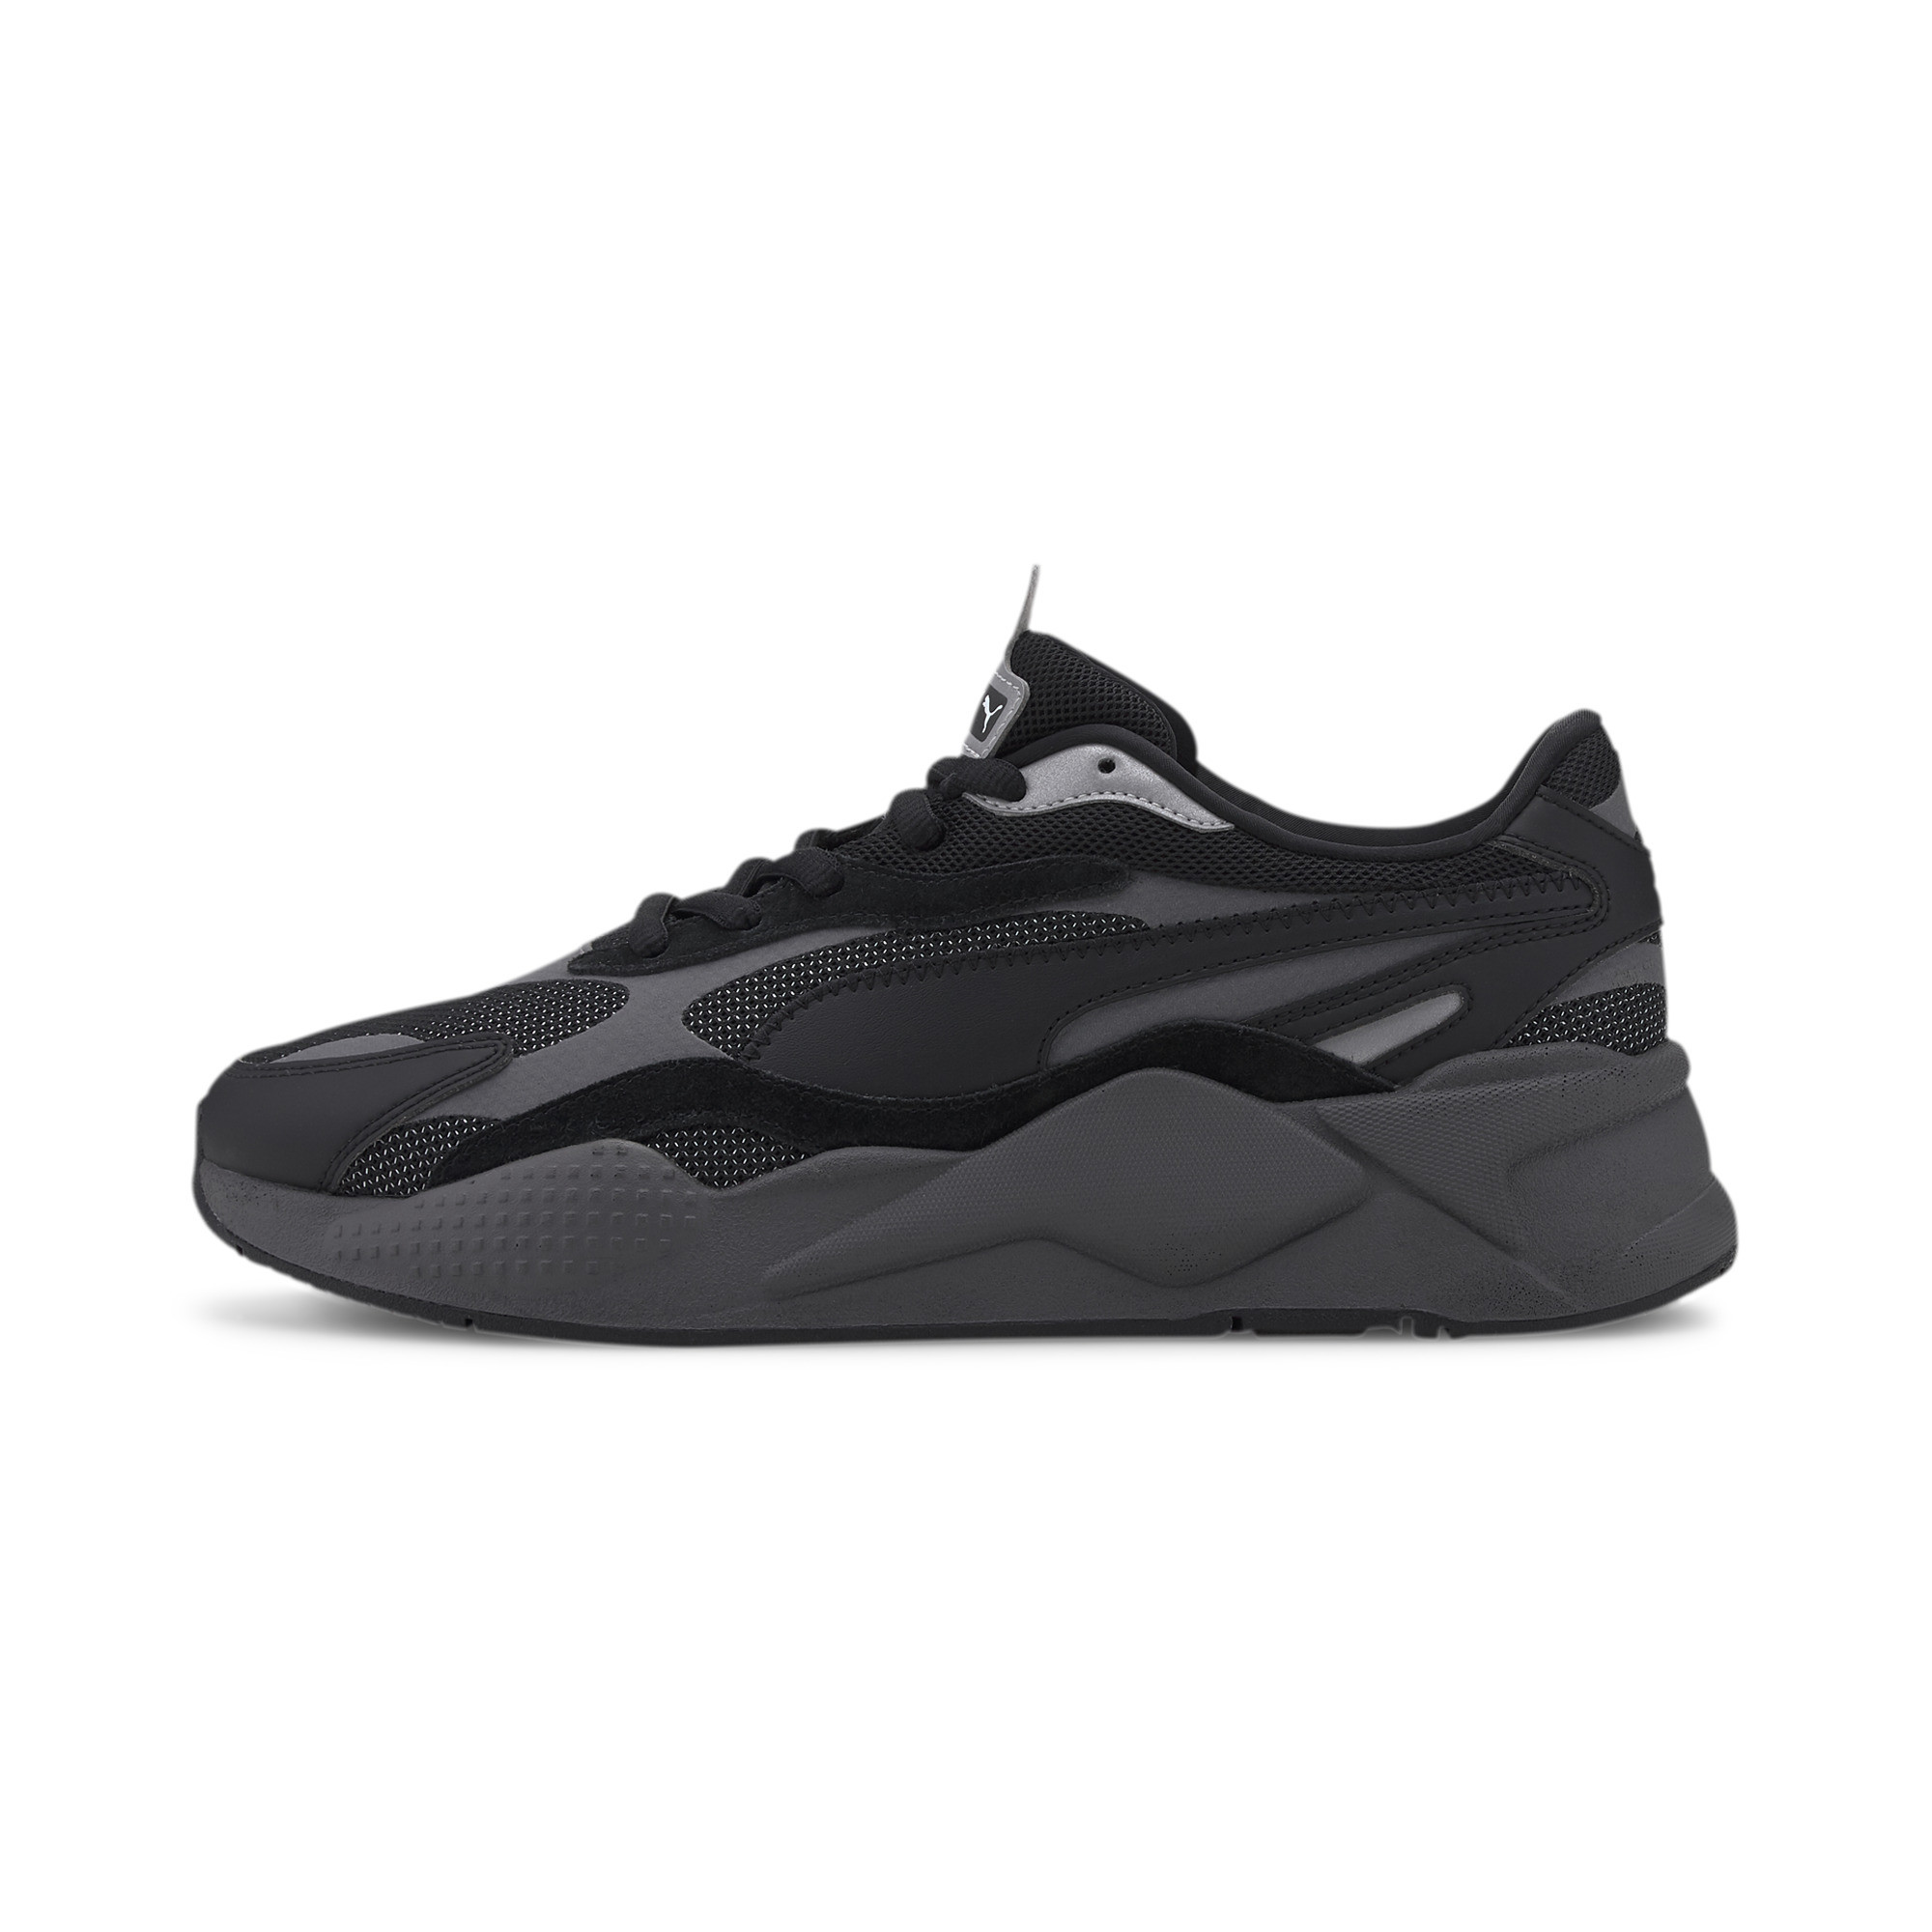 PUMA-Men-039-s-RS-X-Puzzle-Sneakers thumbnail 24